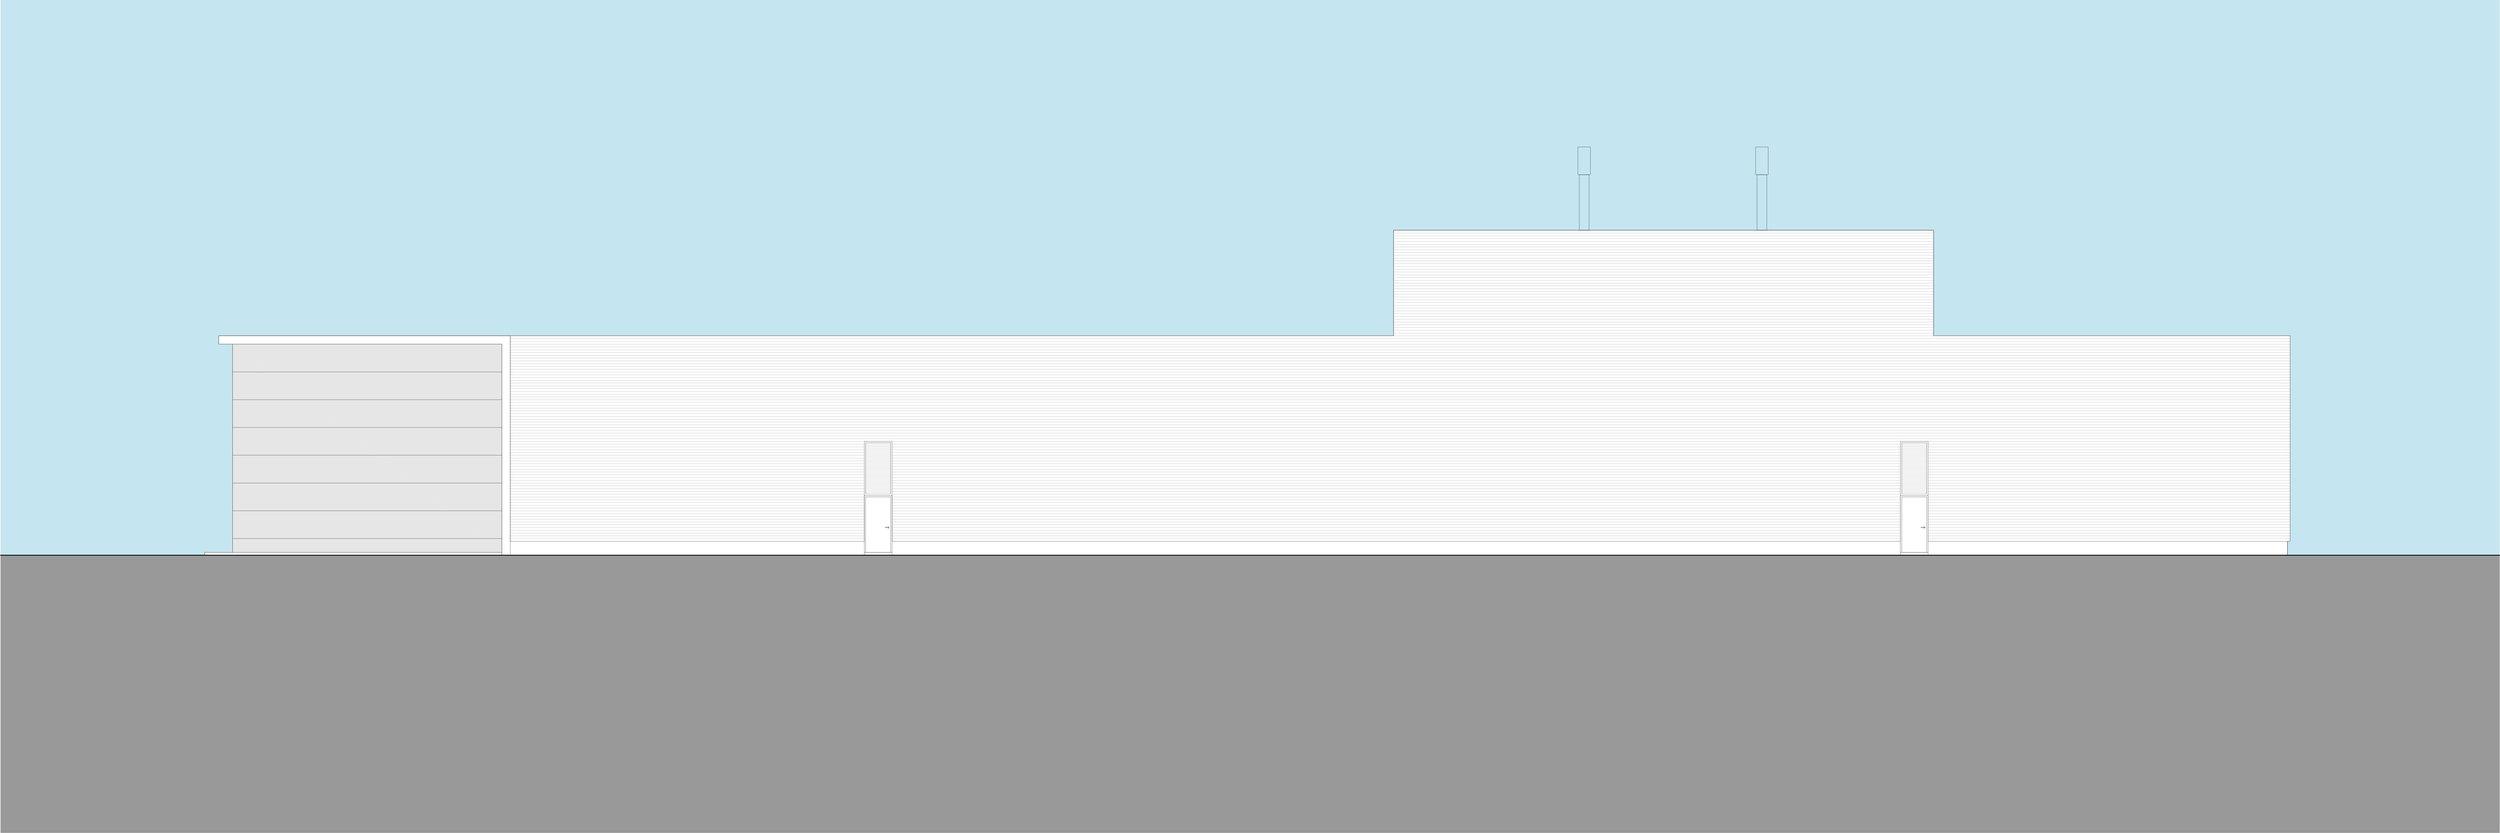 Paulo Miguez Arquitectos - Torrefação - Unidade Industrial  - Abrantesl 4.jpg